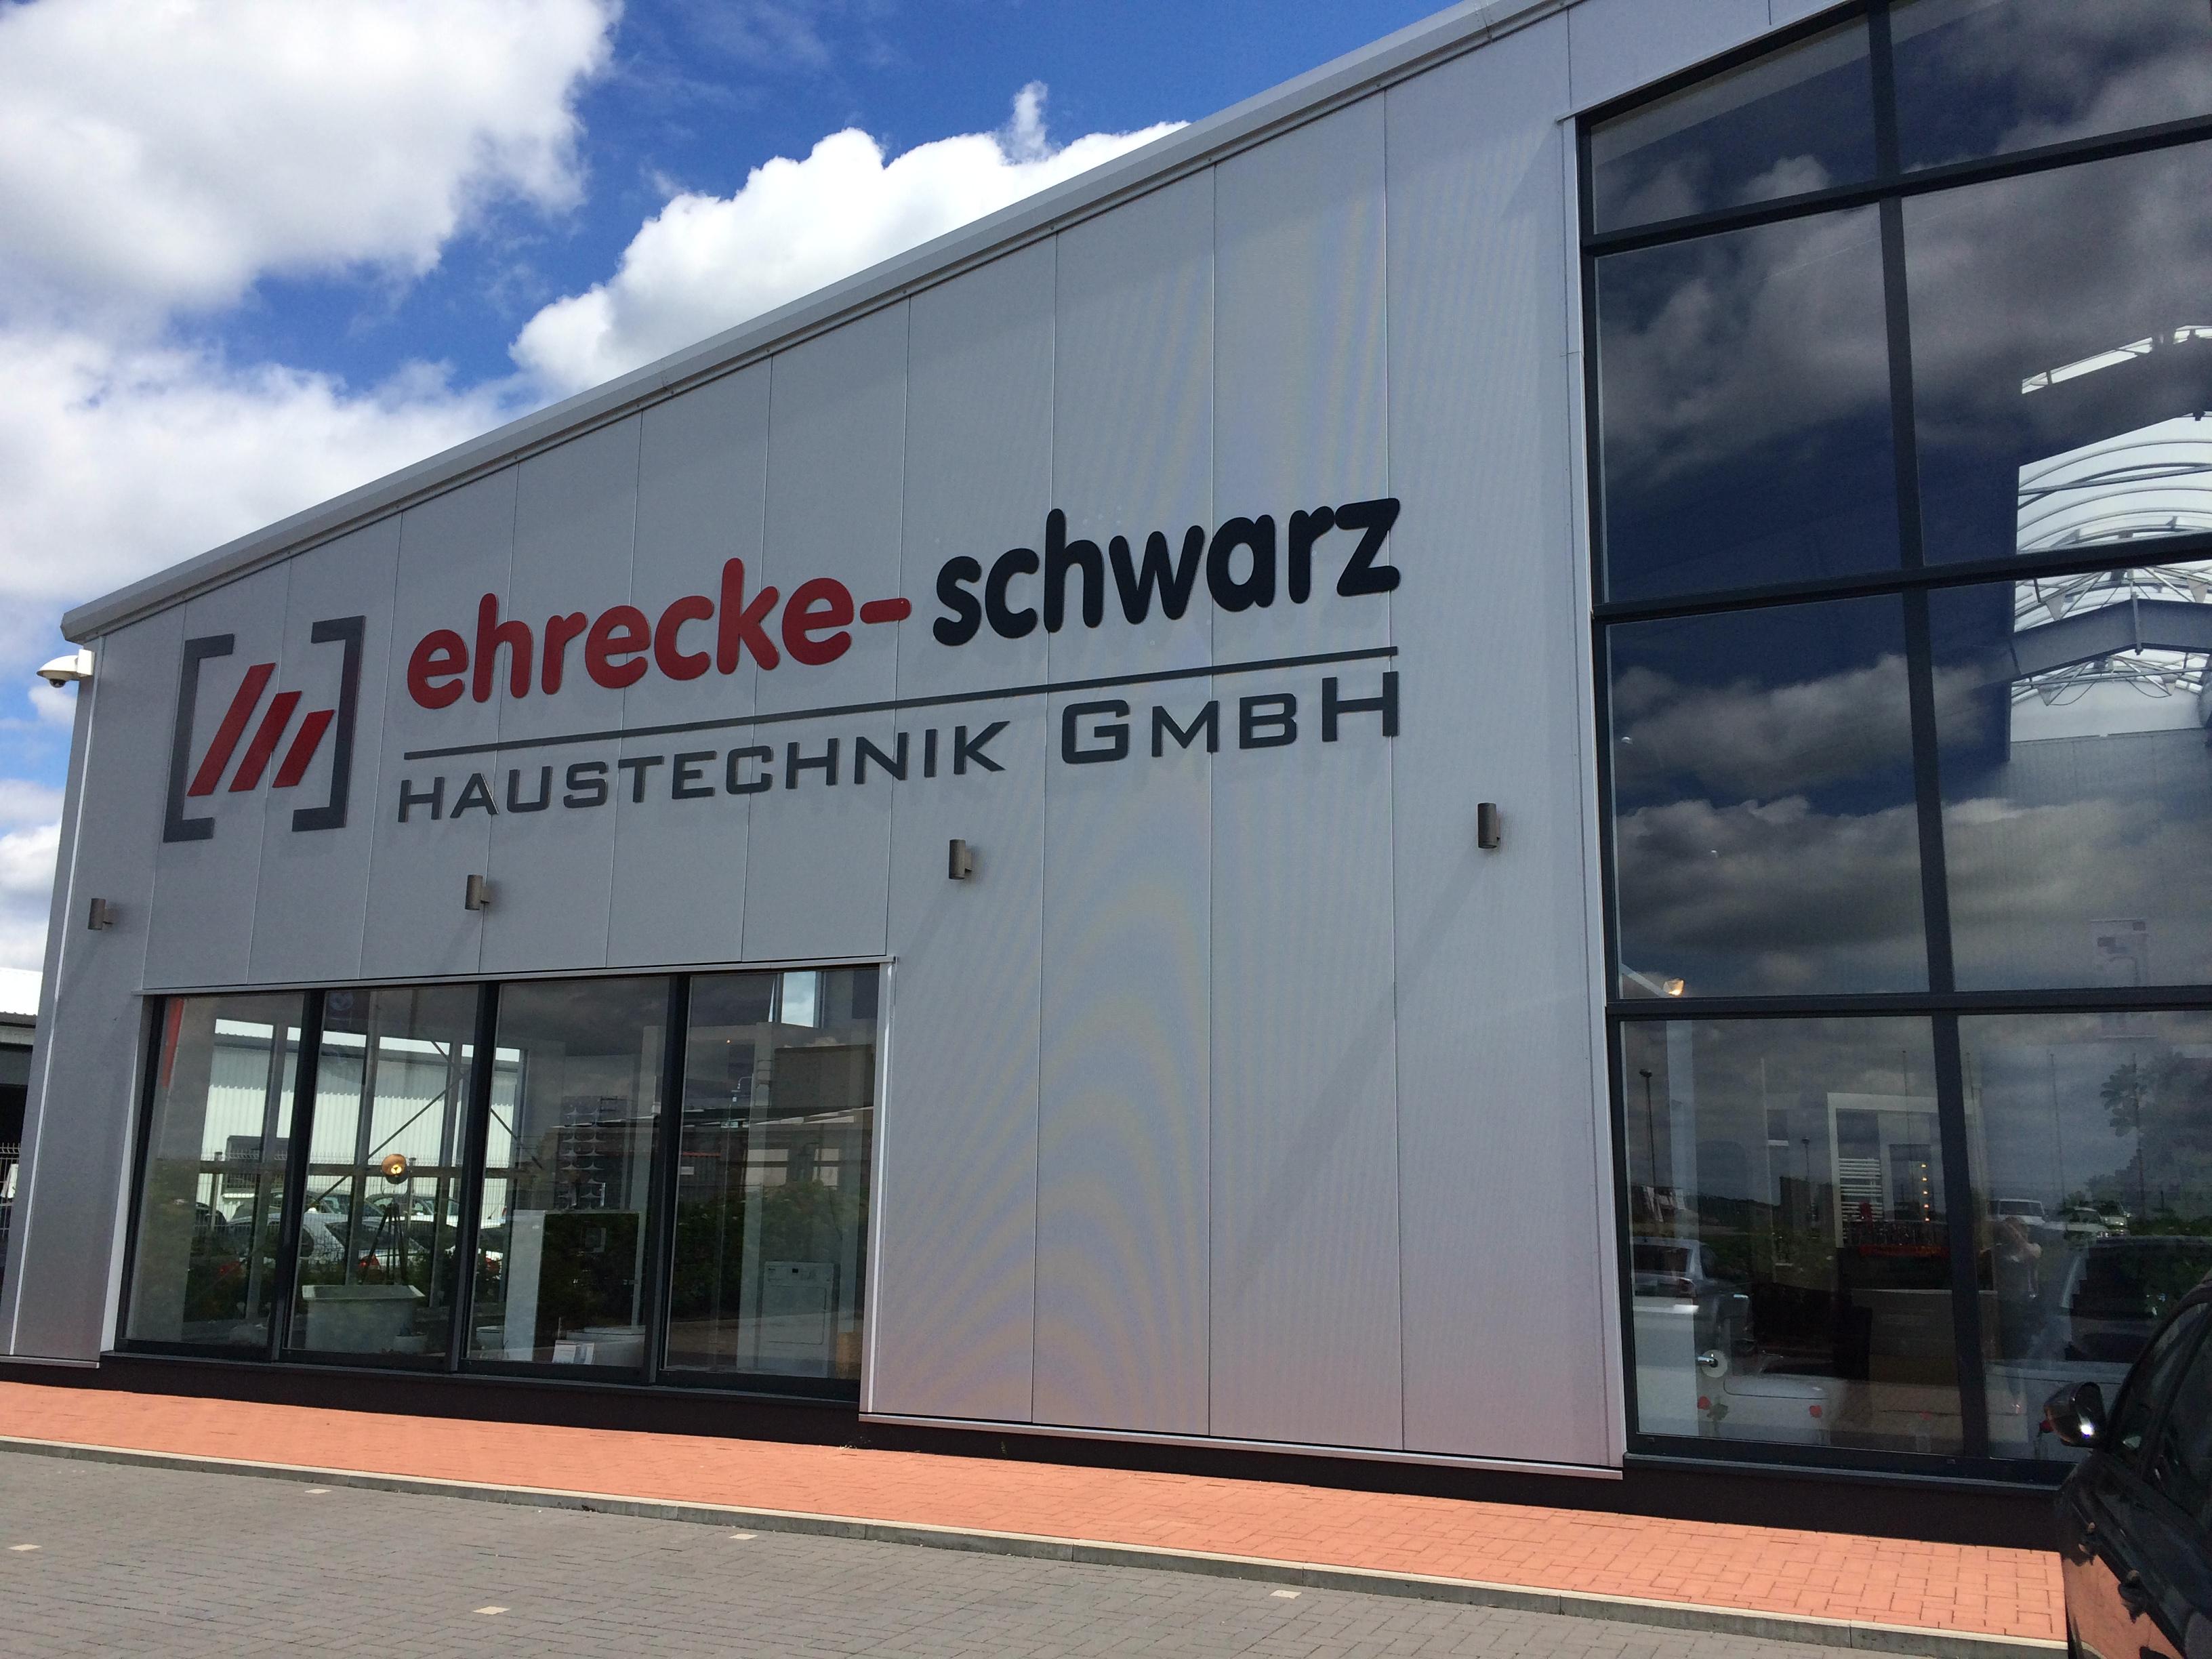 Schwarz Haustechnik image2 jpg